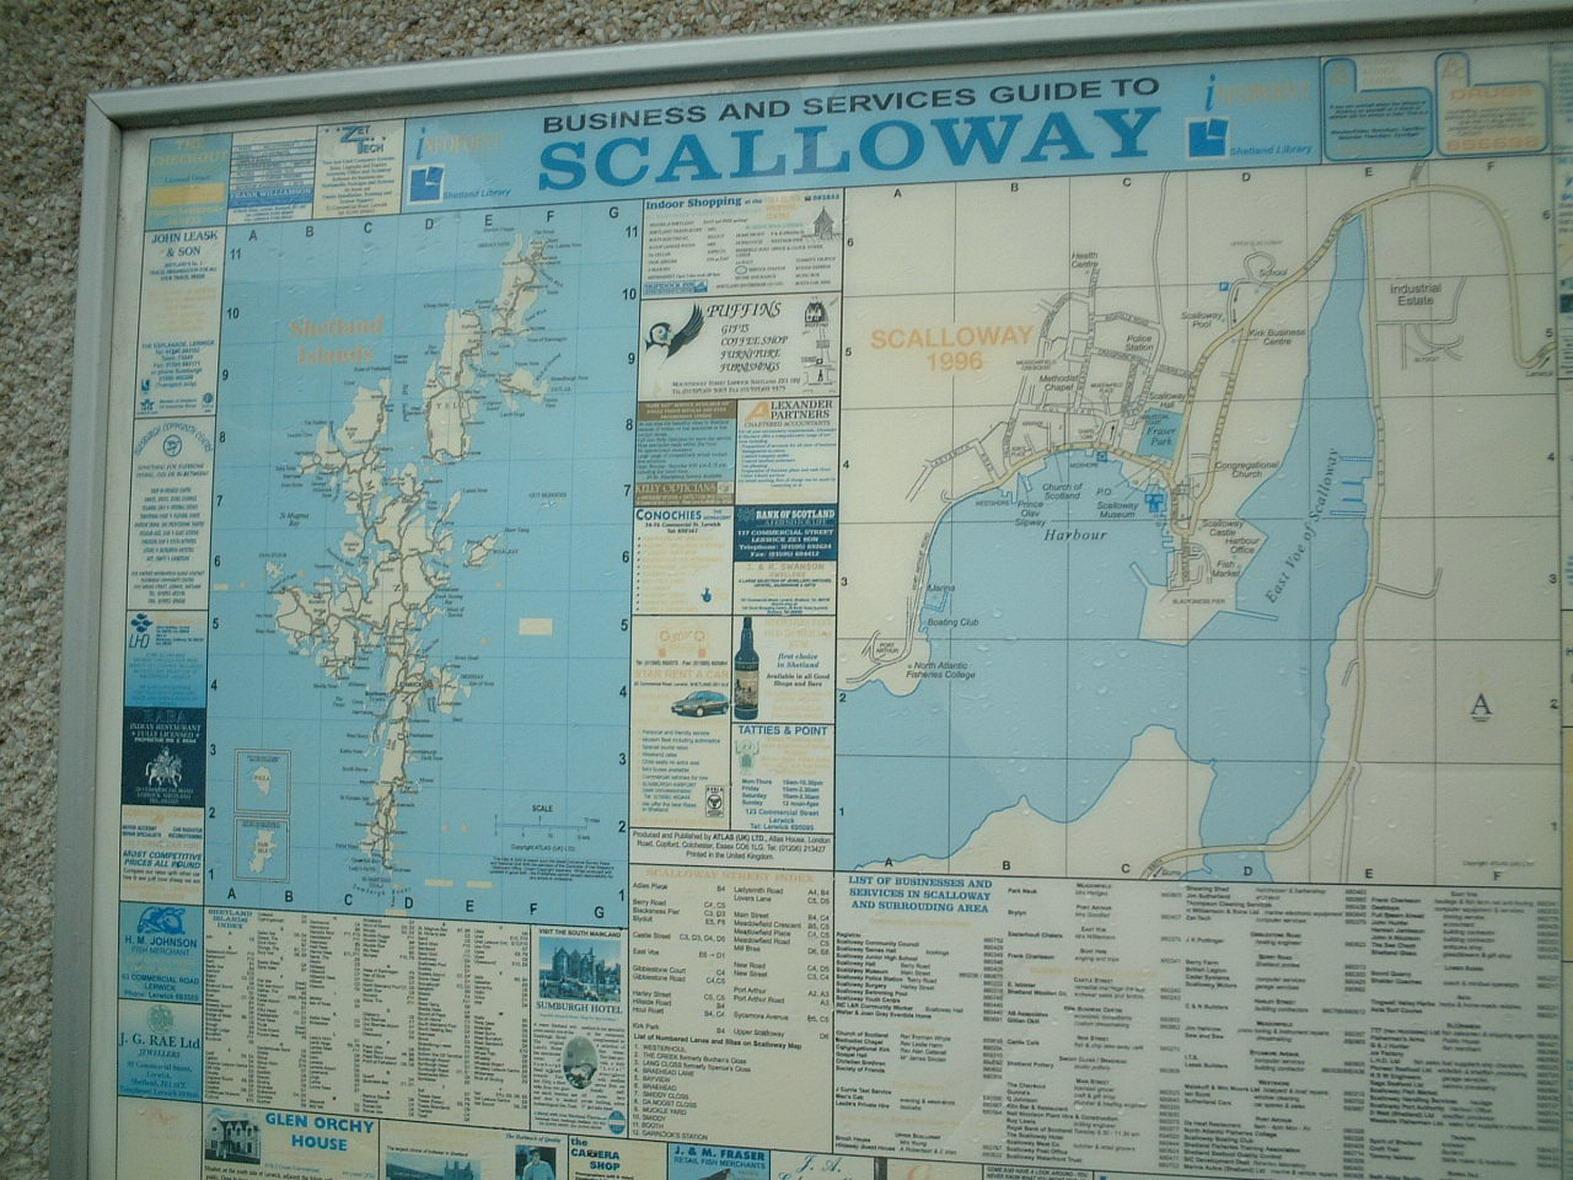 Scalloway03.jpg